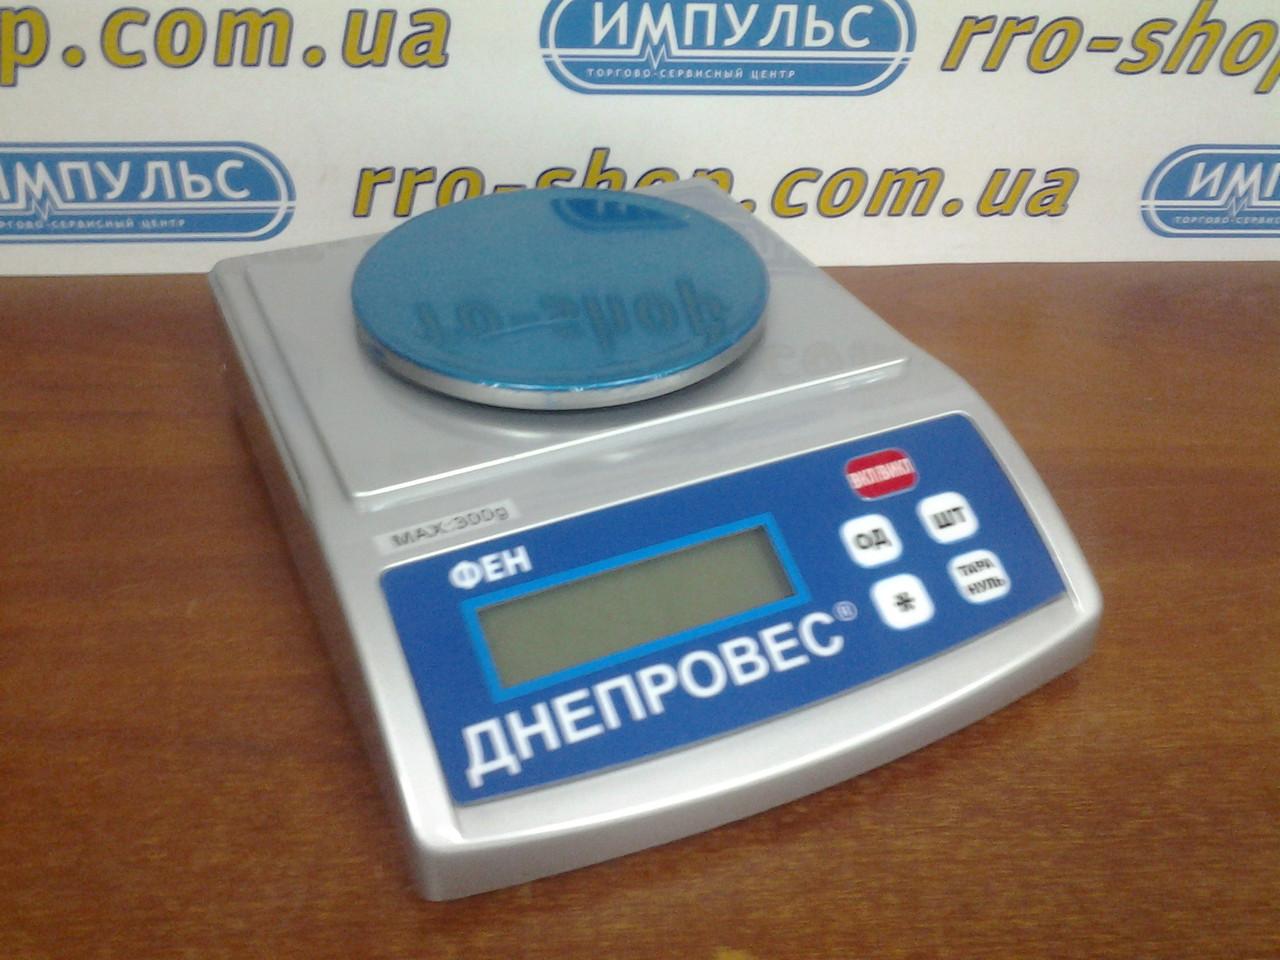 Весы лабораторные Днепровес ФЕН-300Л/ФЕН-600Л (0,01 г)